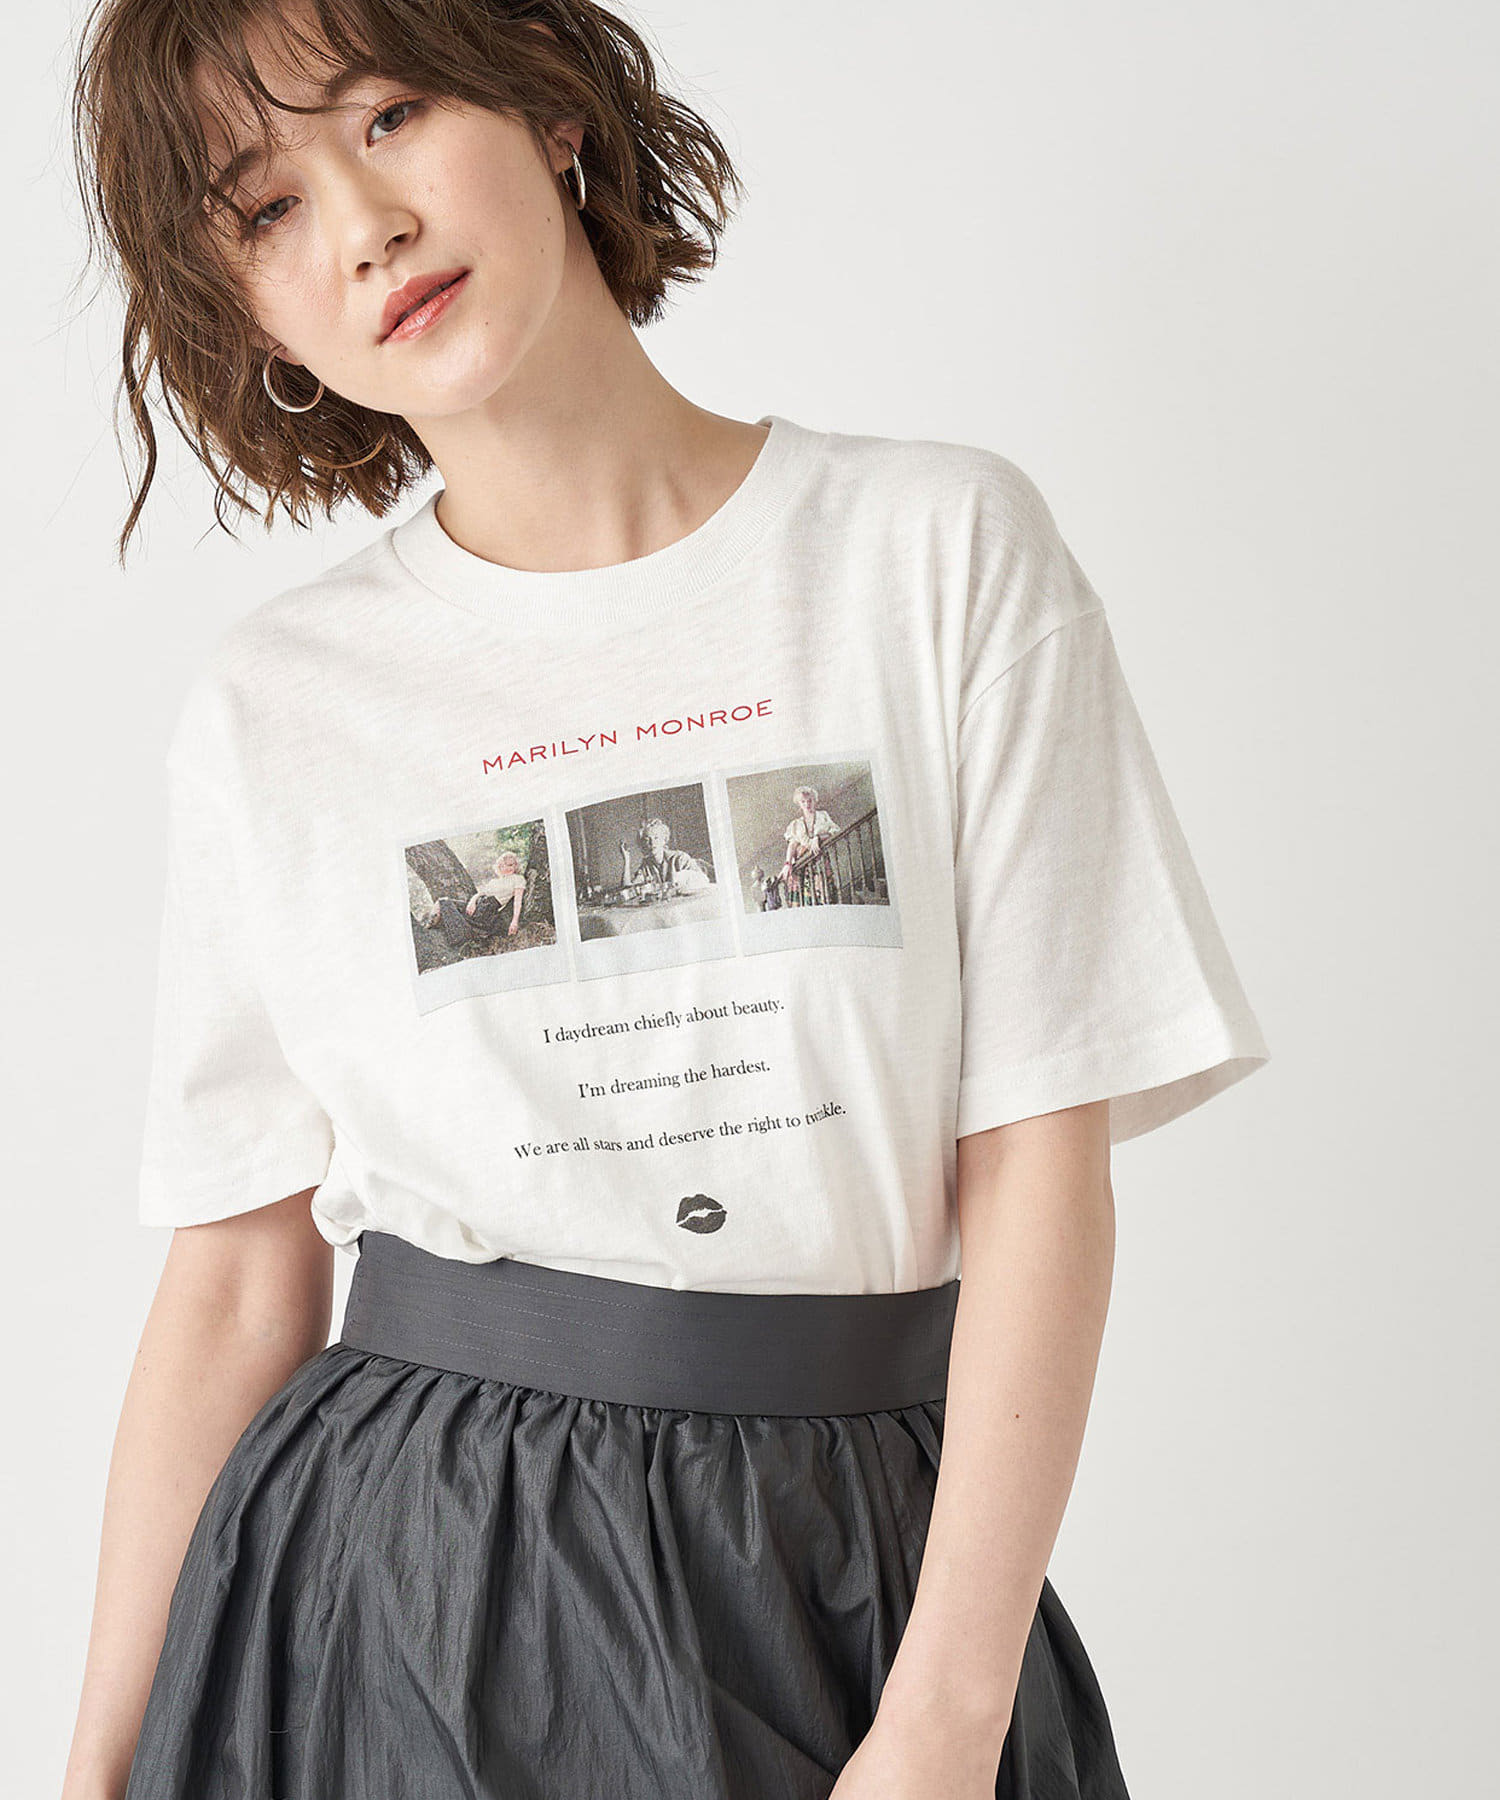 RIVE DROITE(リヴドロワ) レディース 【GOOD ROCK SPEED】MARILLINフォトTシャツ オフホワイト